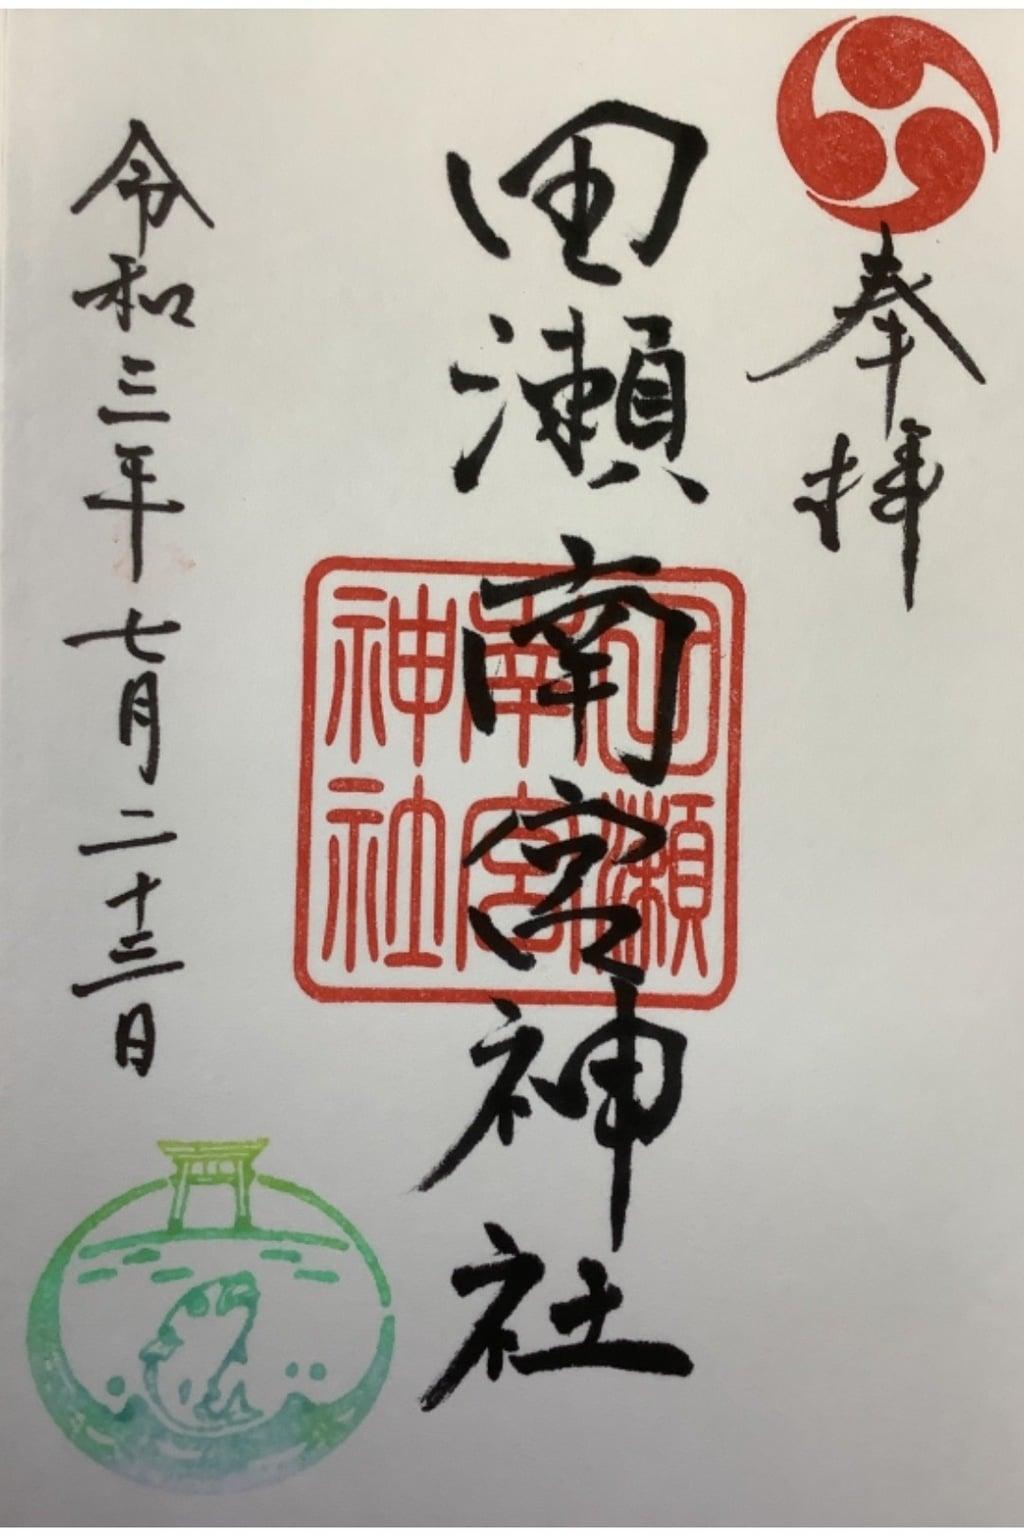 田瀬神社の御朱印